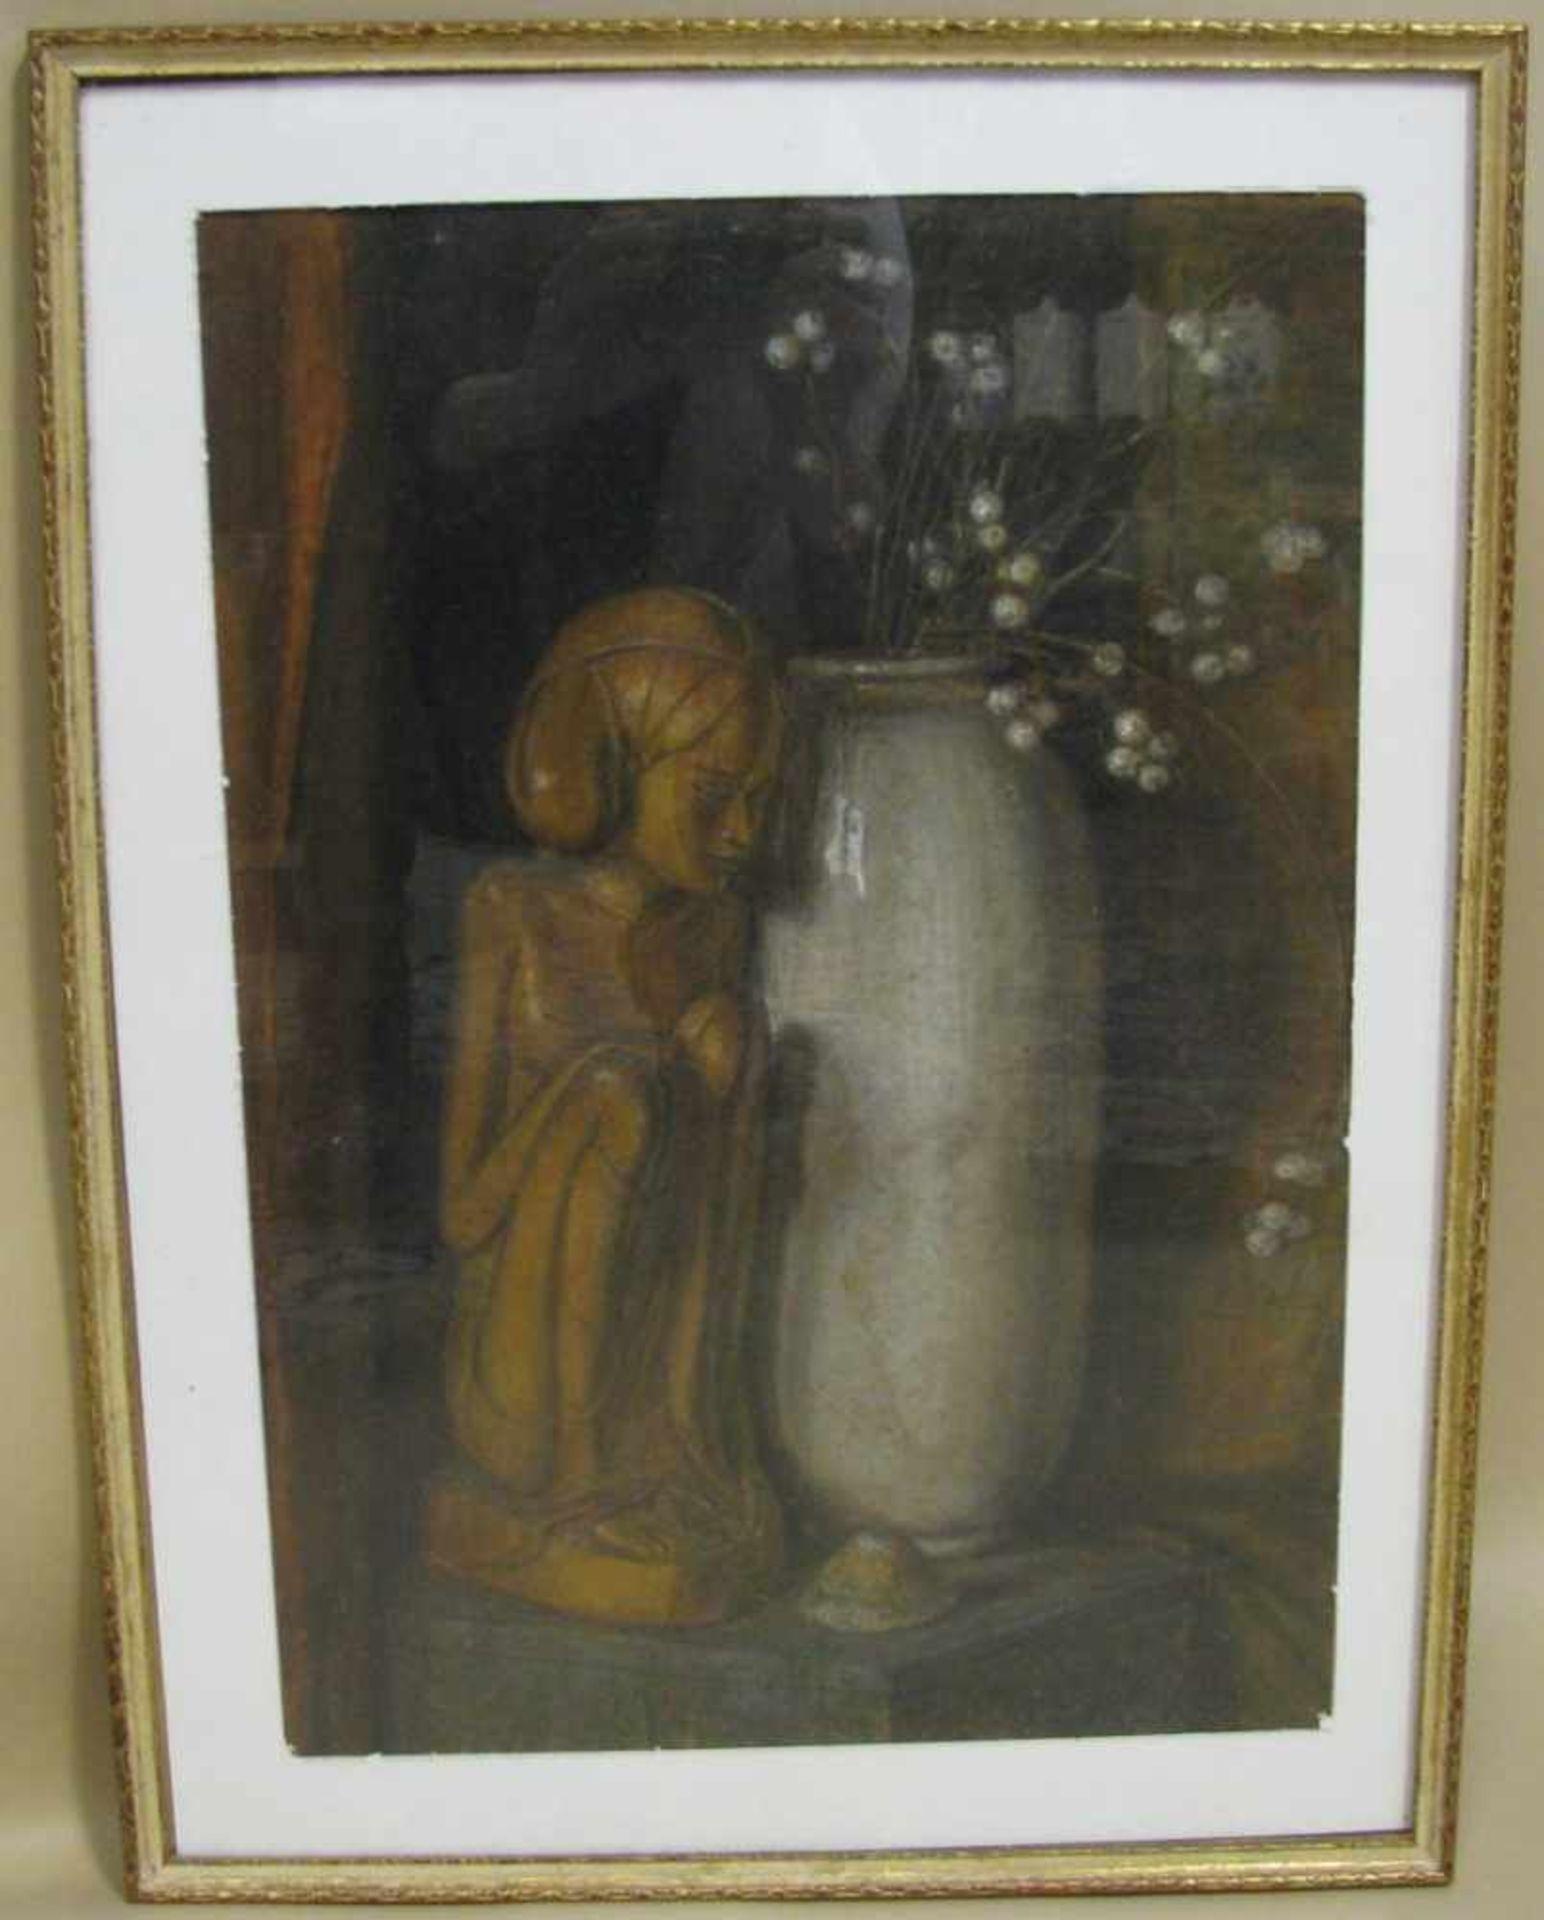 Uyldert-Mayer, Klothilde Ida Charlotte ('Lotte'), 1876 - 1960, Heidelberg, 1895 - 1897 Stud. bei Dr.